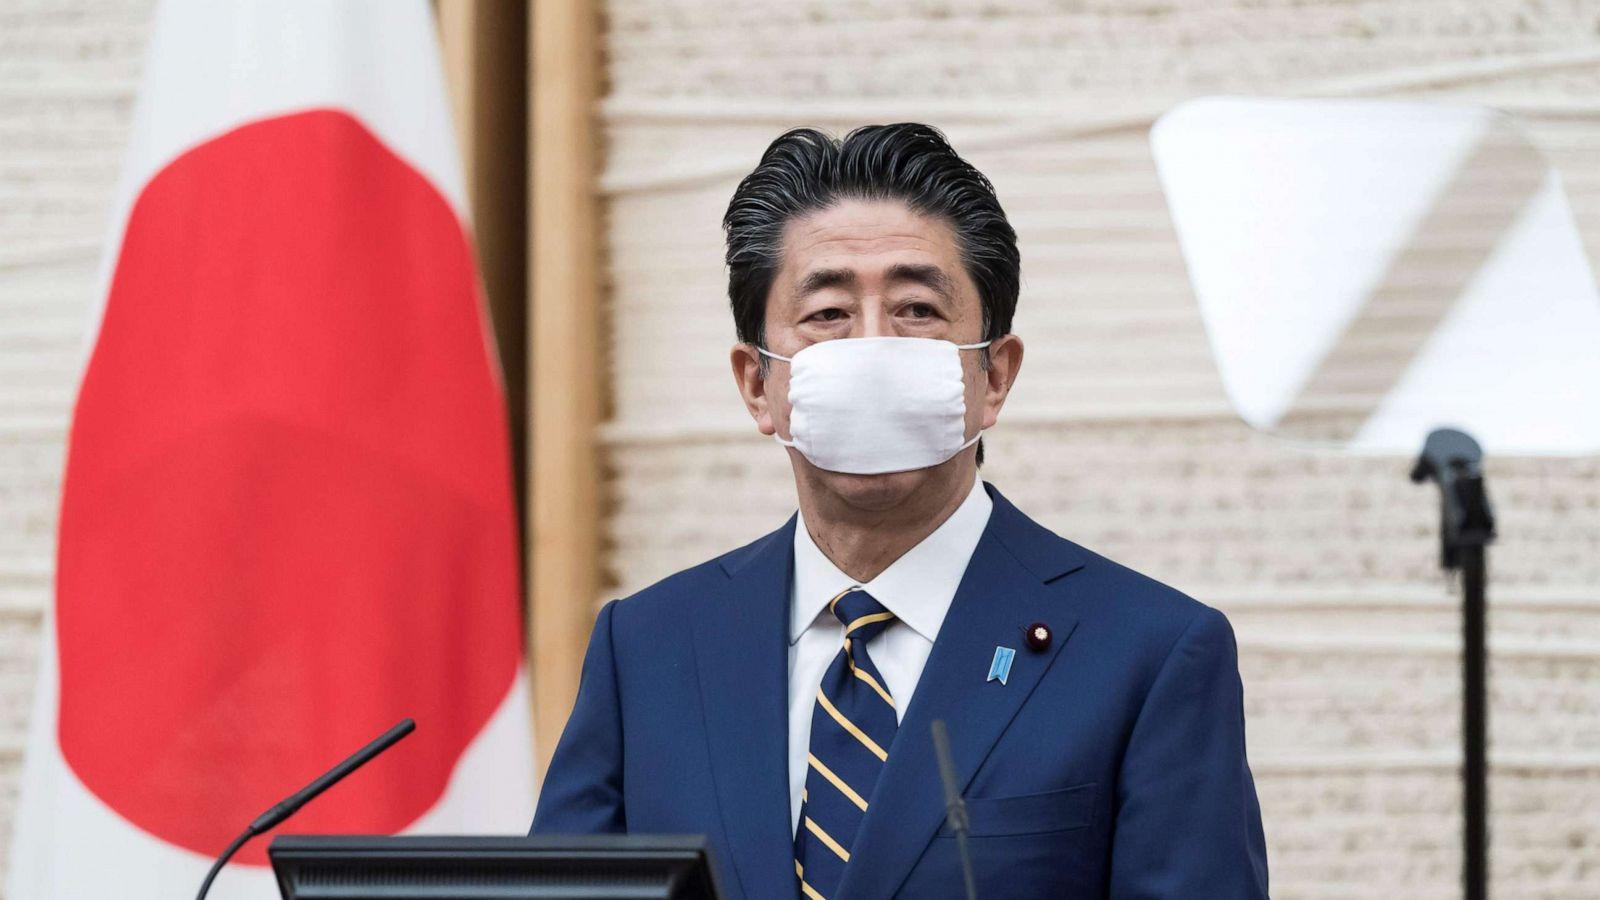 Japan S Sudden Spike In Coronavirus Cases After Tokyo Olympics Postponement Raises Eyebrows Abc News